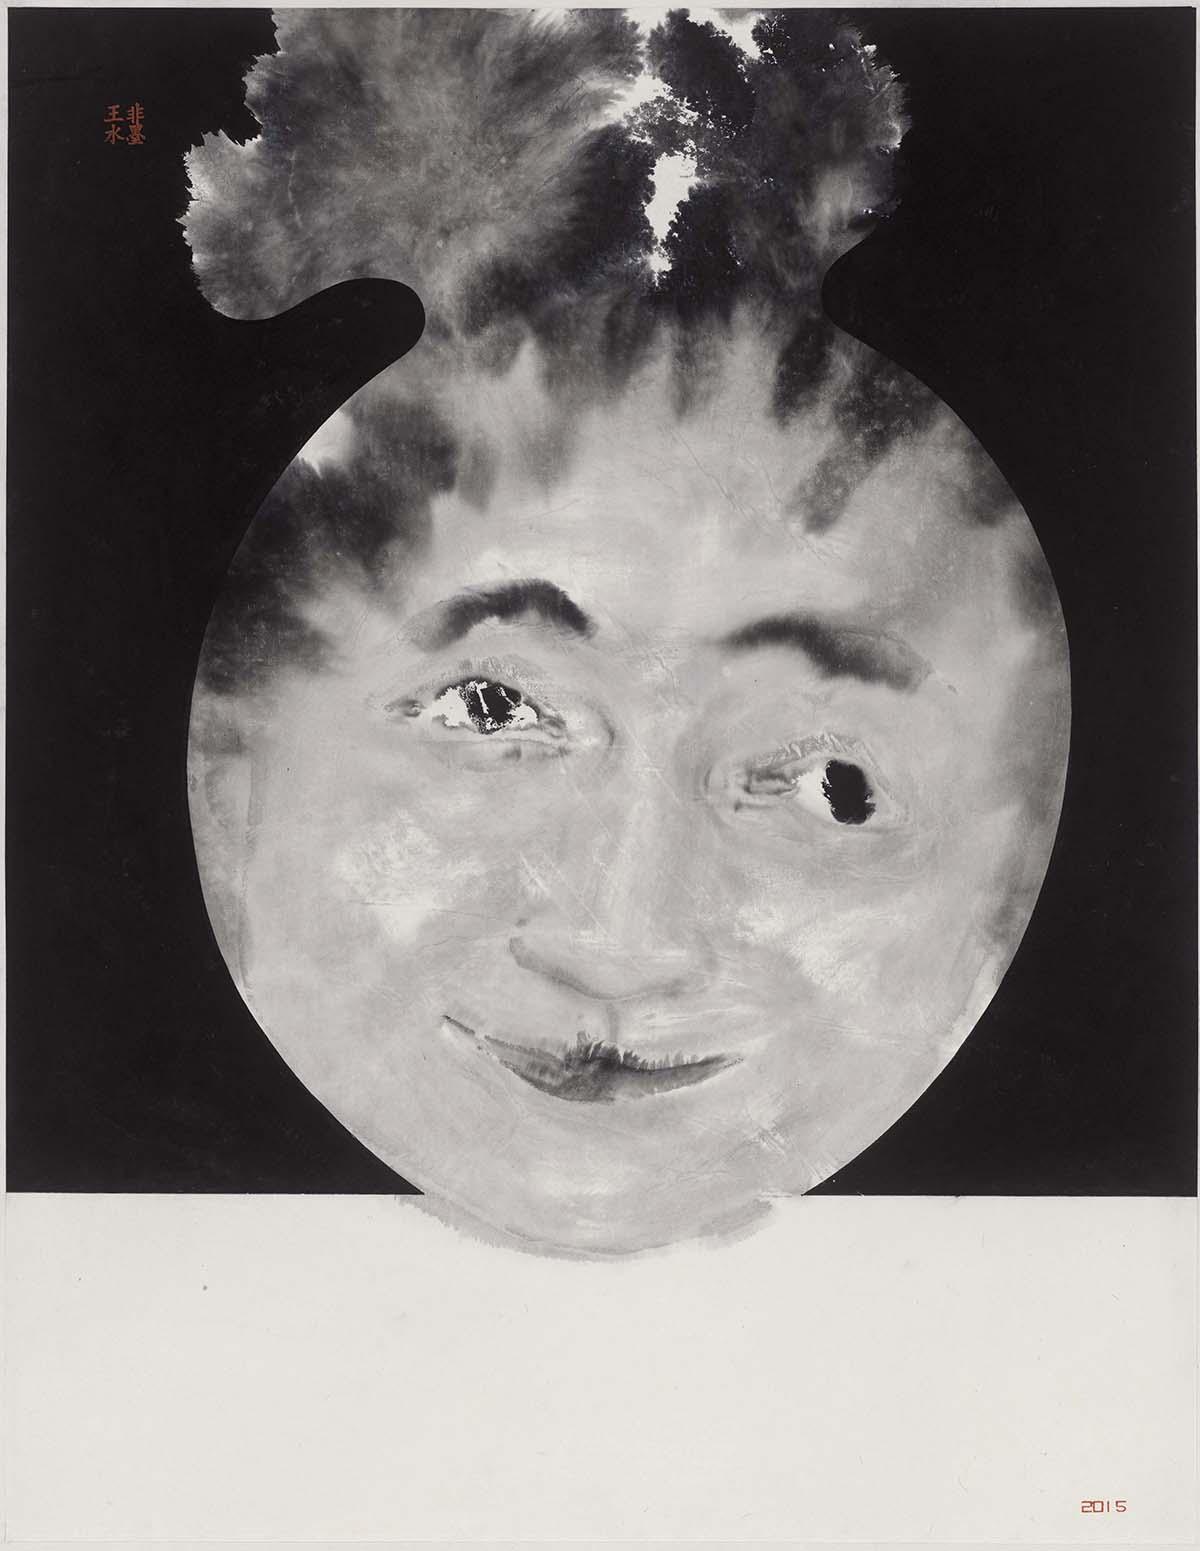 Faces - Wang Fei's Ink Paintings